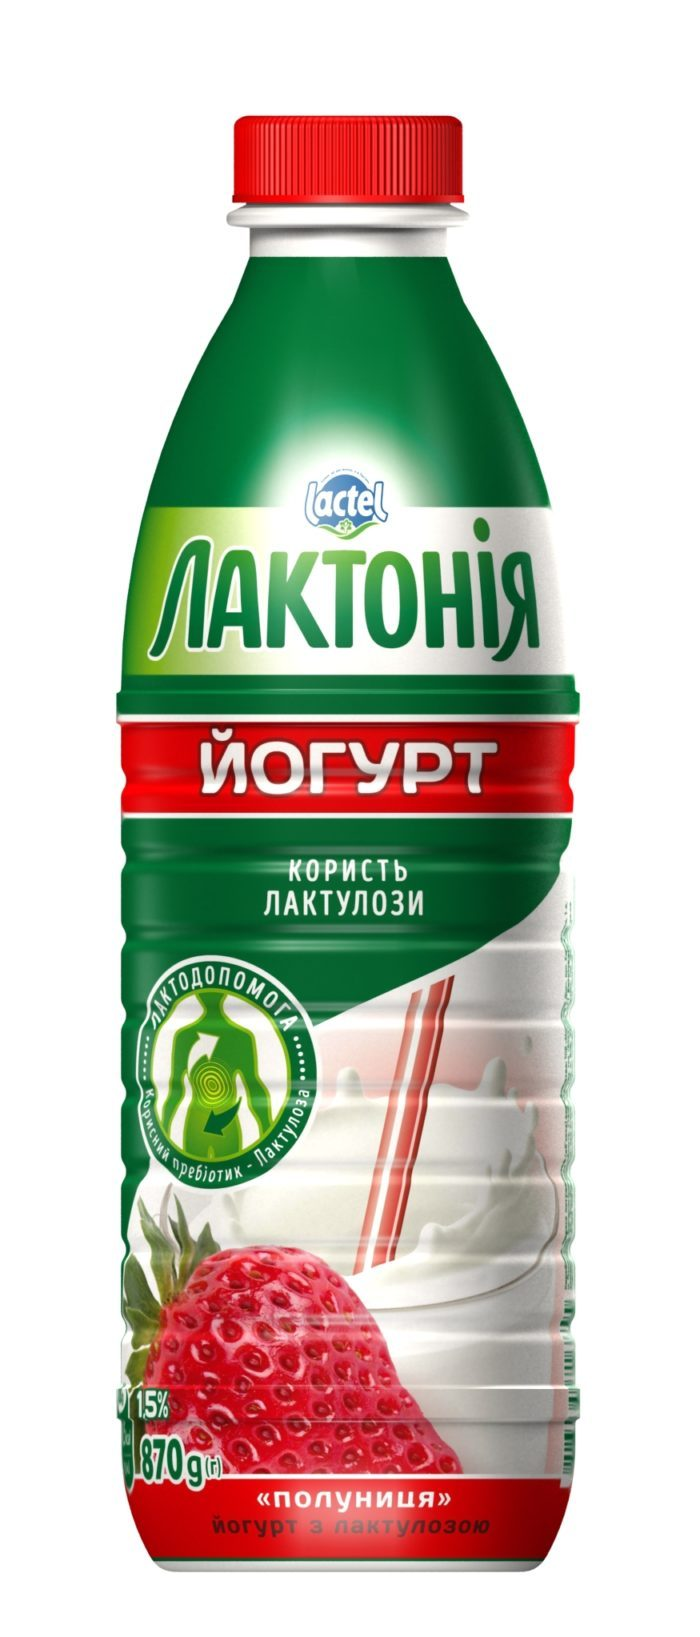 "Yogurt Strawberry with lactulose 1,5%,  ""Lactonia"" (Bottle 0,870)"